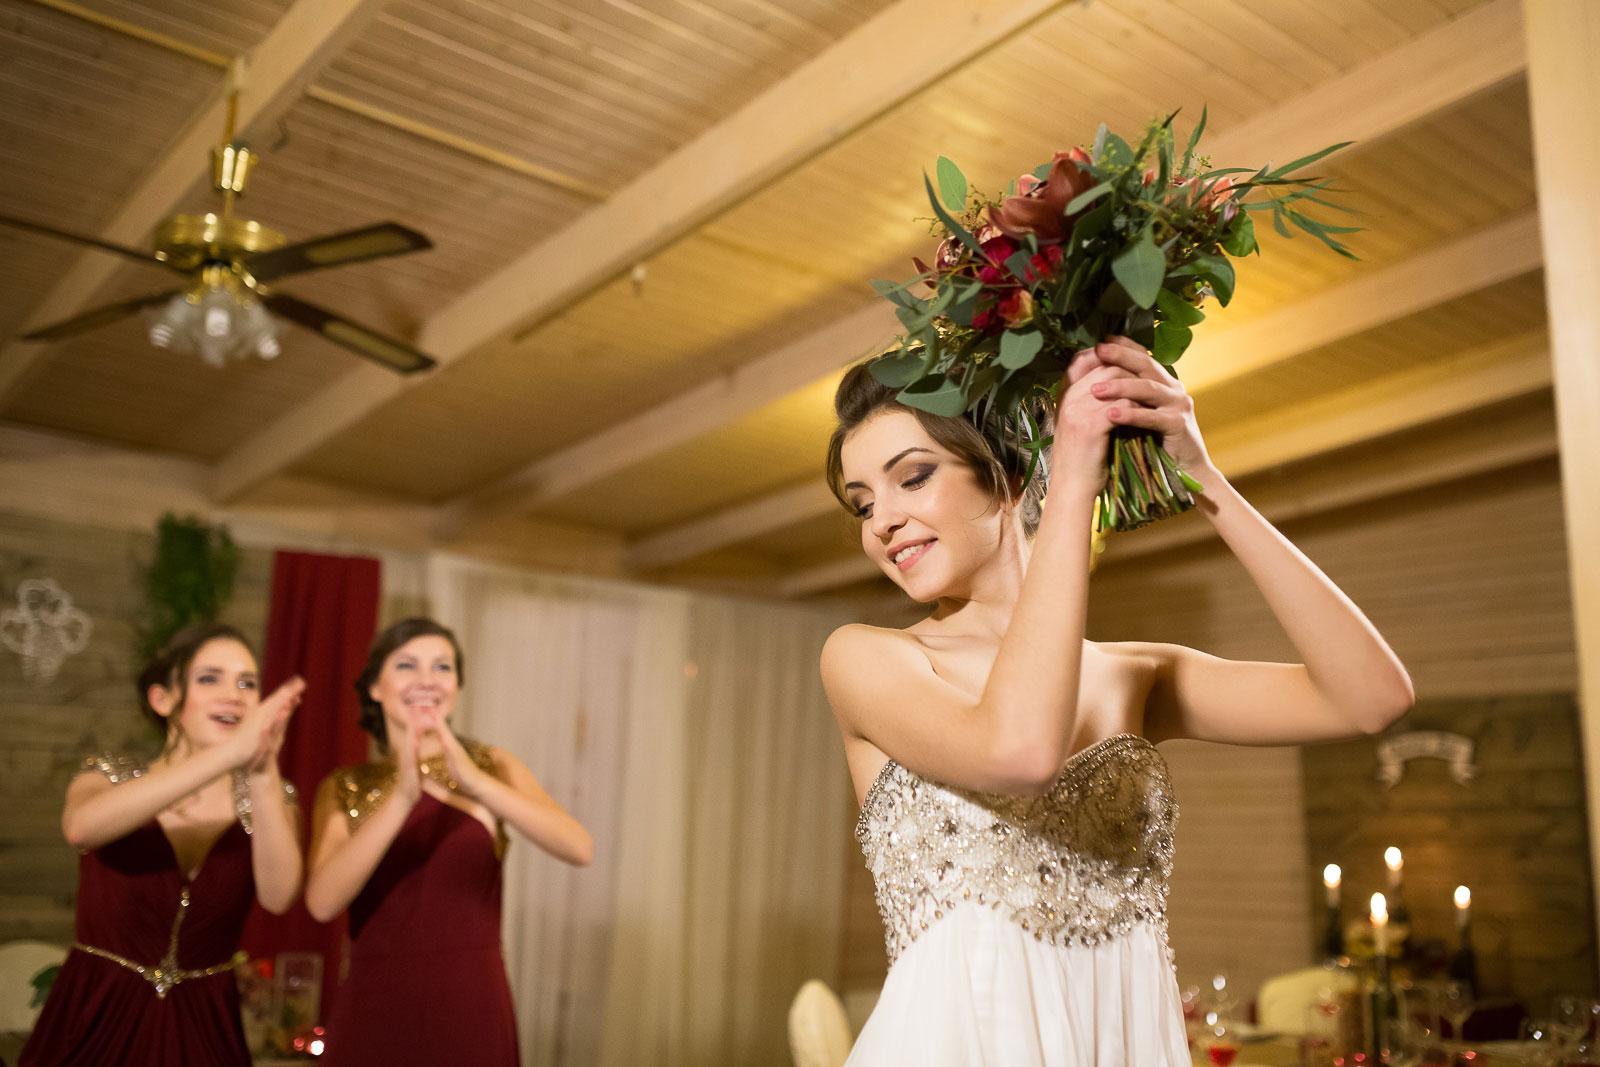 Свадьба и Love Story, фотограф в Москве